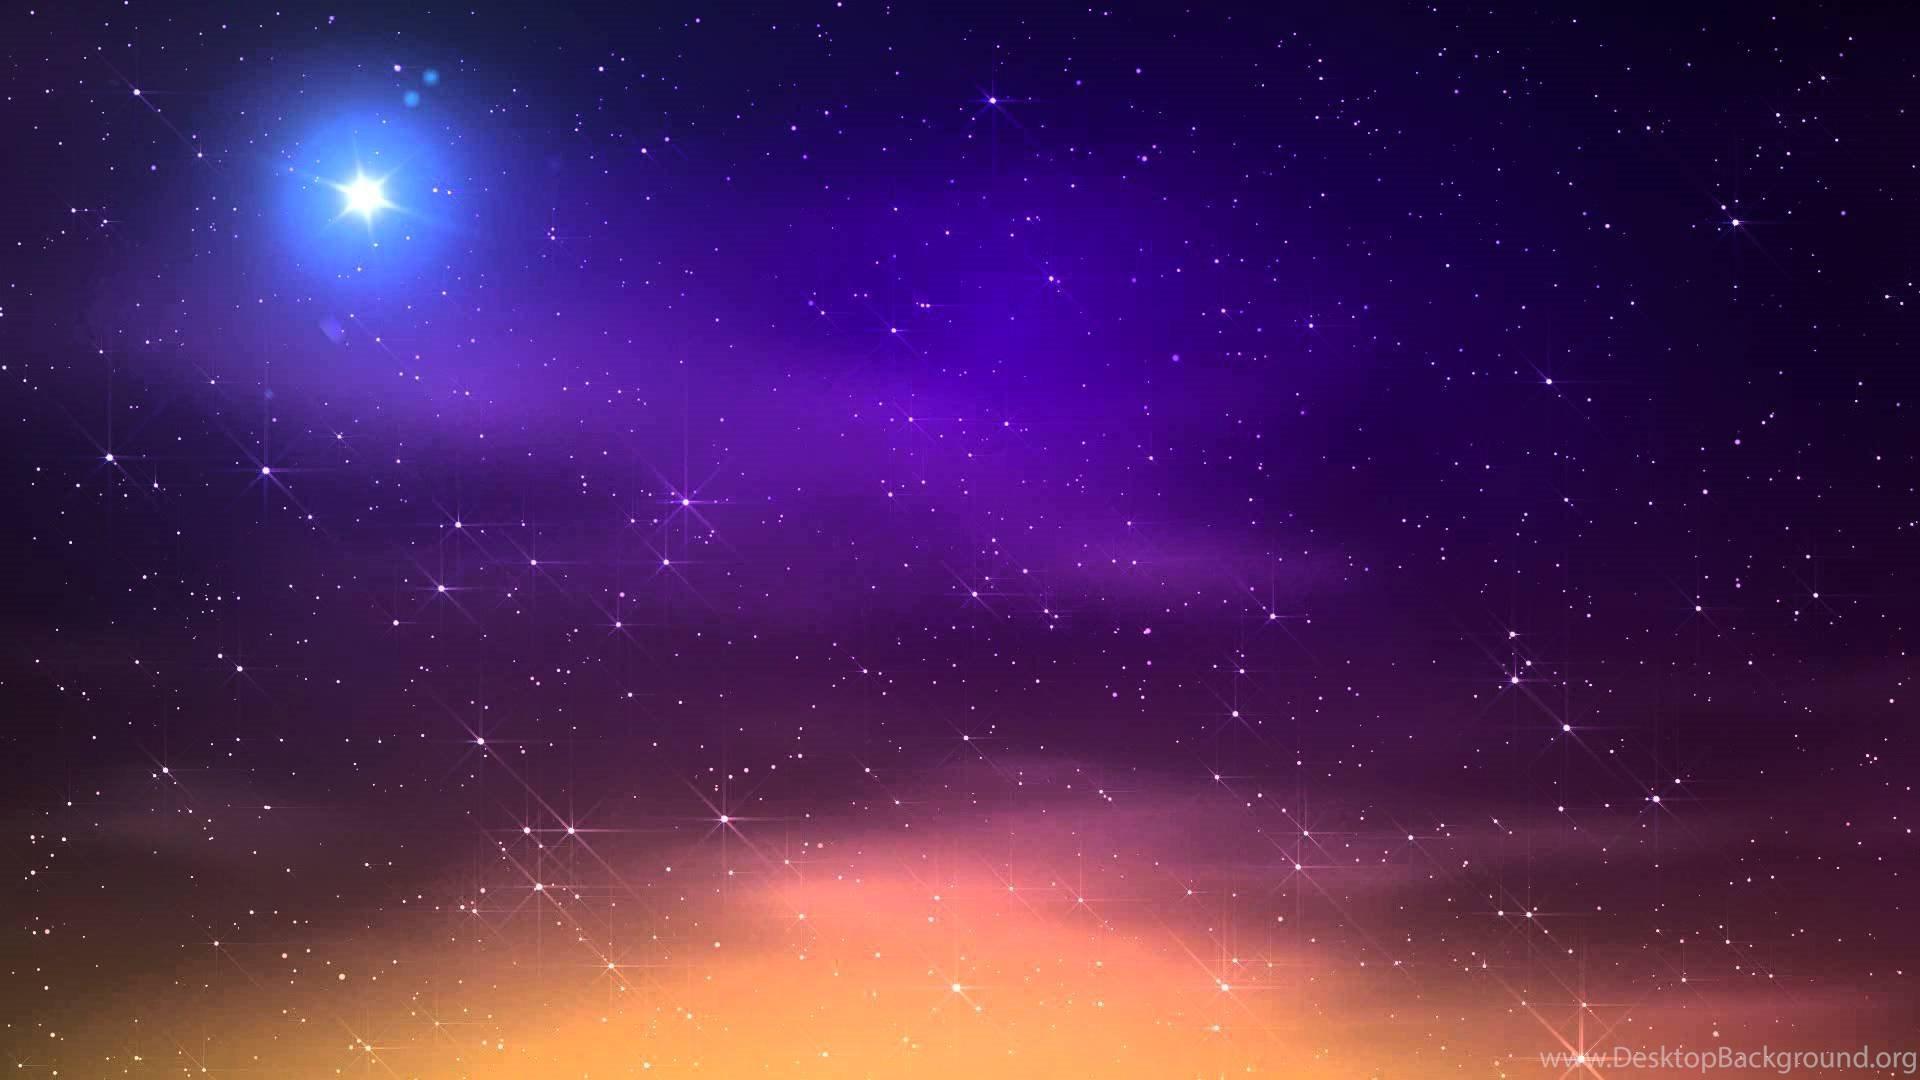 Video backgrounds hd moon midnight star sky hd style desktop background - Midnight wallpaper hd ...